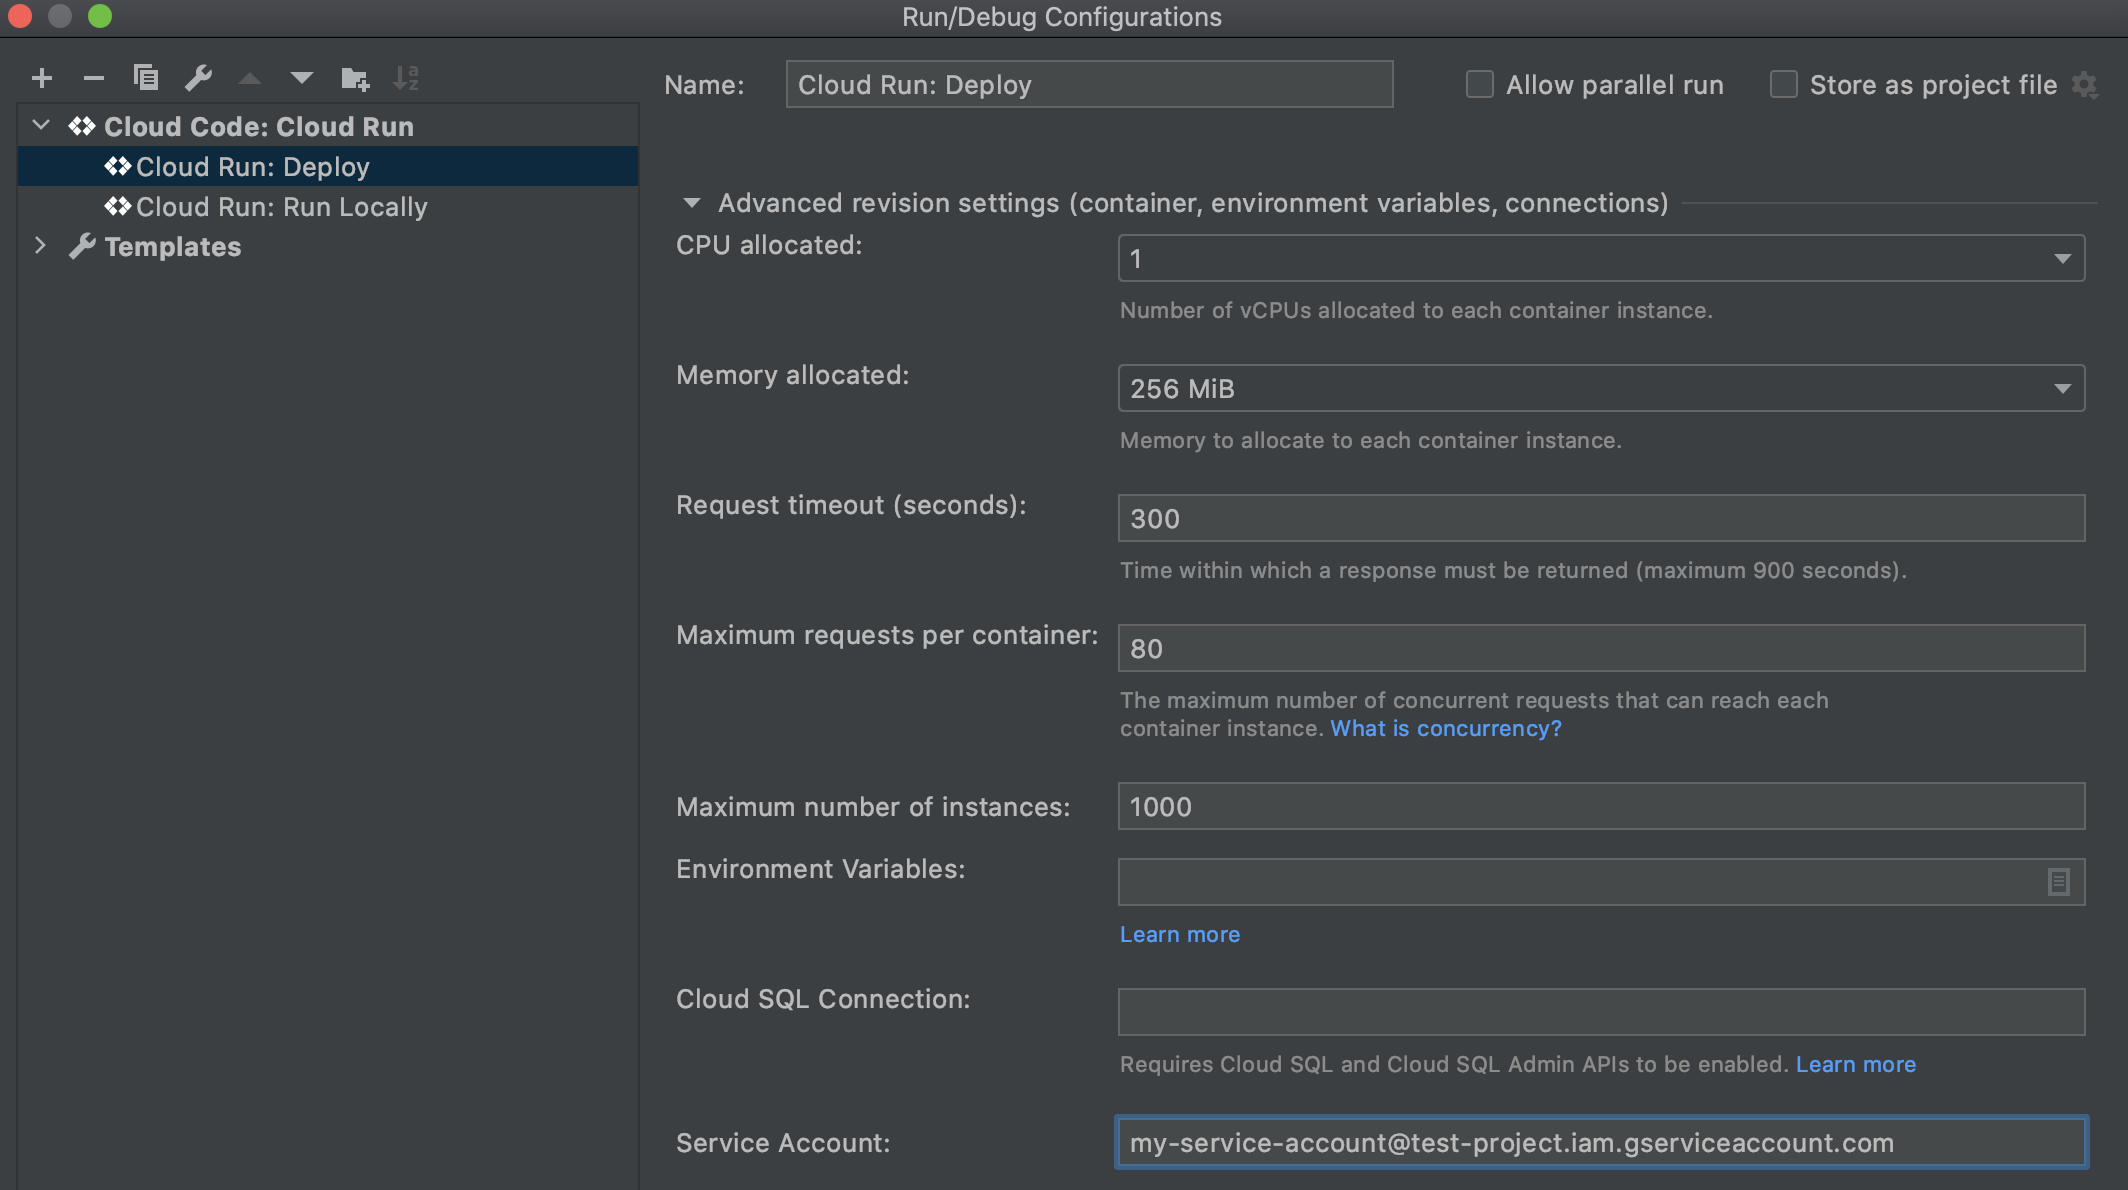 Cloud Run에서 펼쳐진 고급 버전 설정 섹션: service-account-name@project-name.iam.gserviceaccount.com 형식의 서비스 계정 이름이 입력된 배포 및 서비스 계정 필드